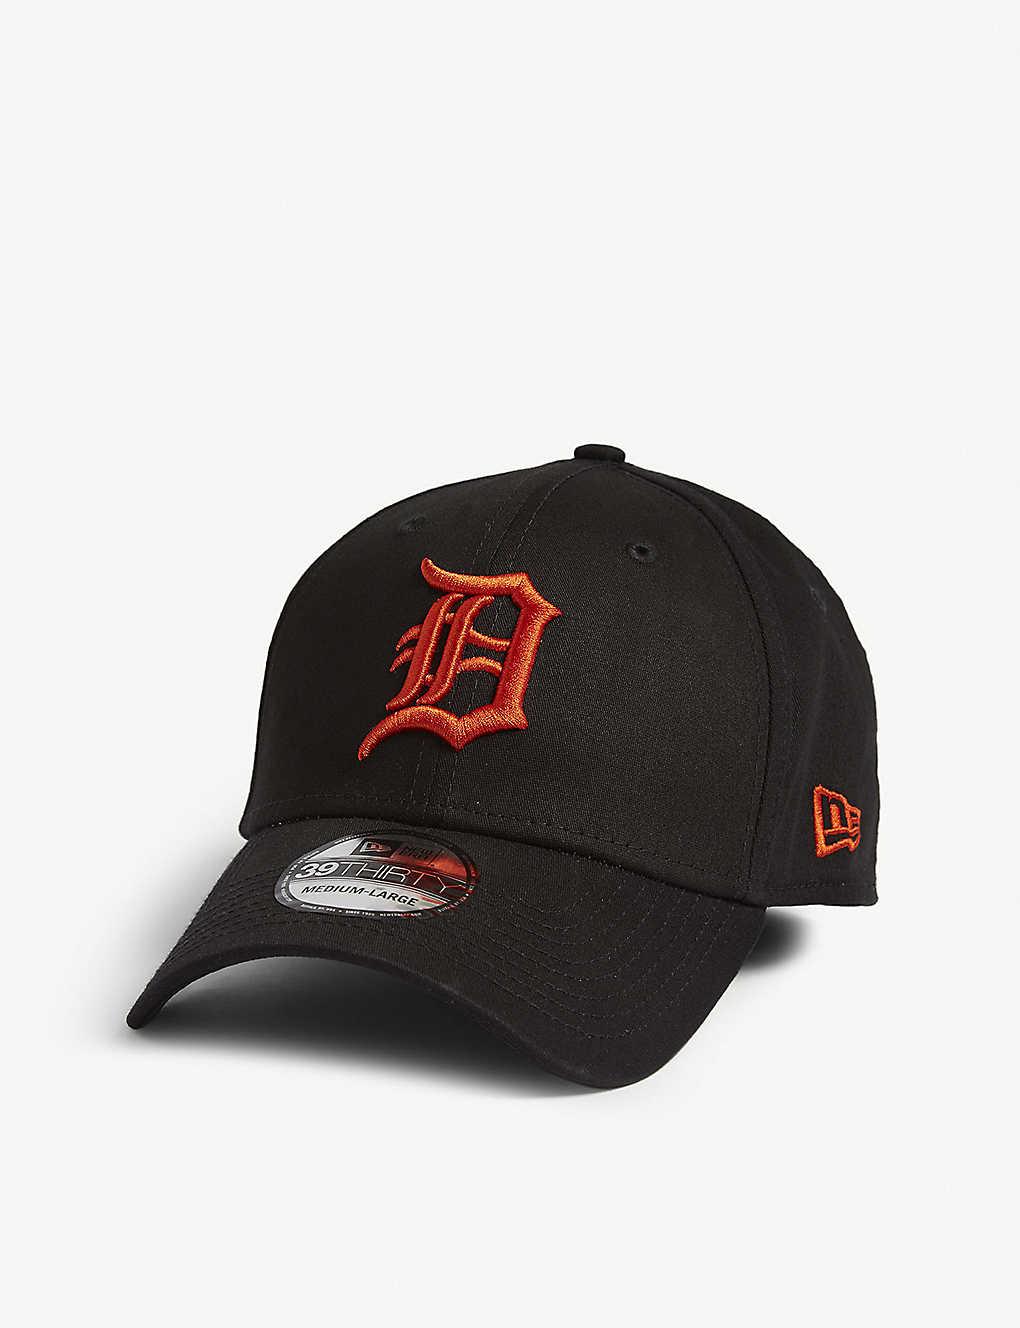 NEW ERA - Detroit Tigers 39THIRTY baseball cap  a56cd7dbb